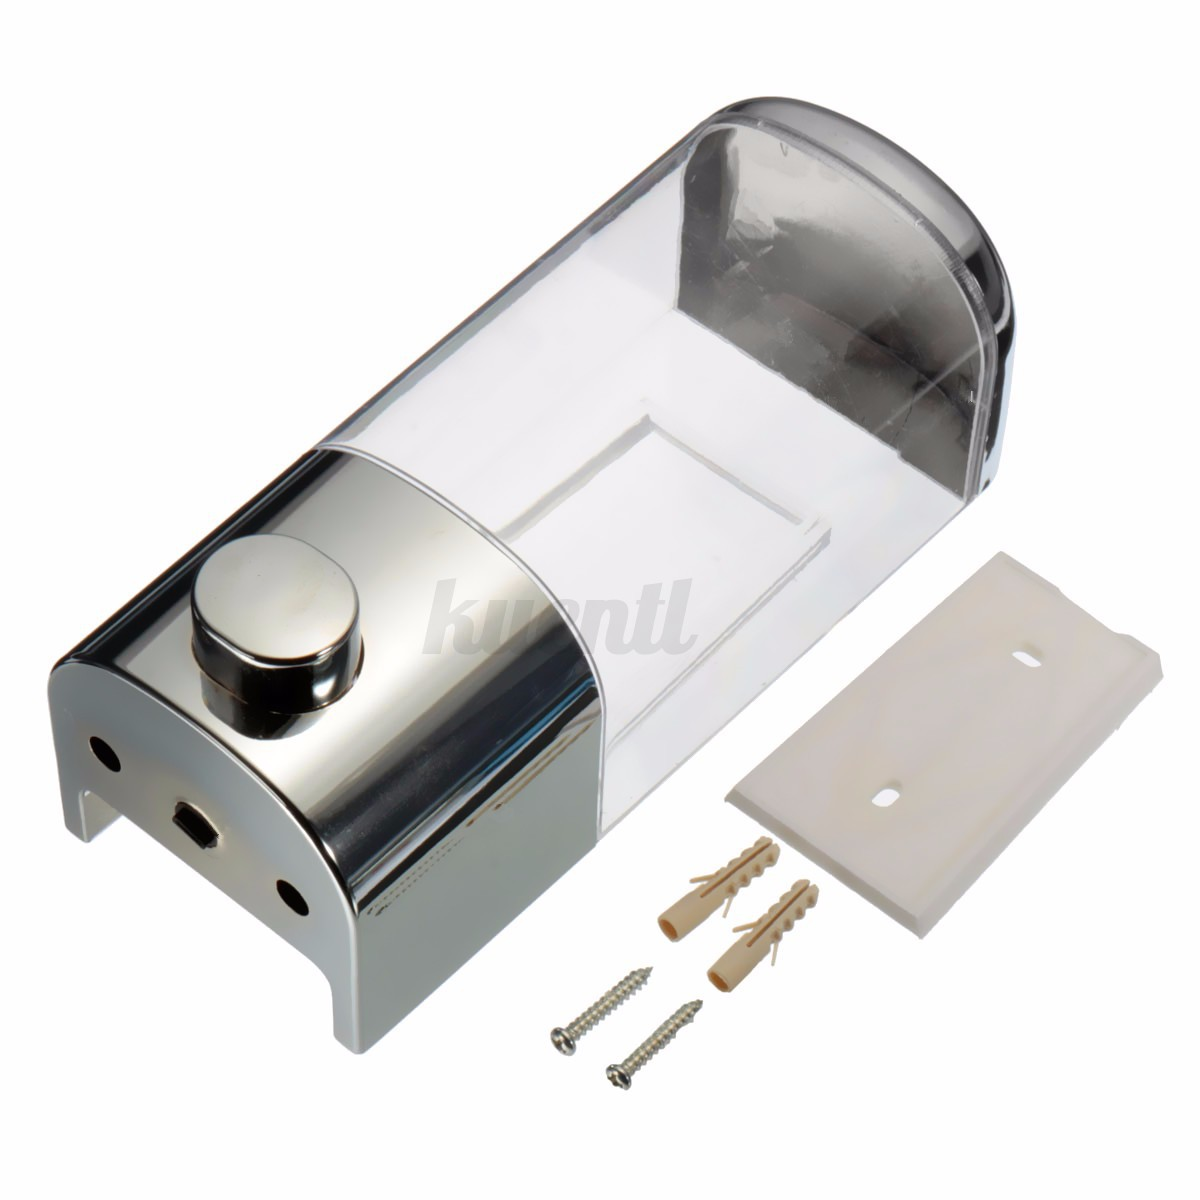 Dispensador de jab n montaje l quido 500ml montado en for Dispensador jabon ducha